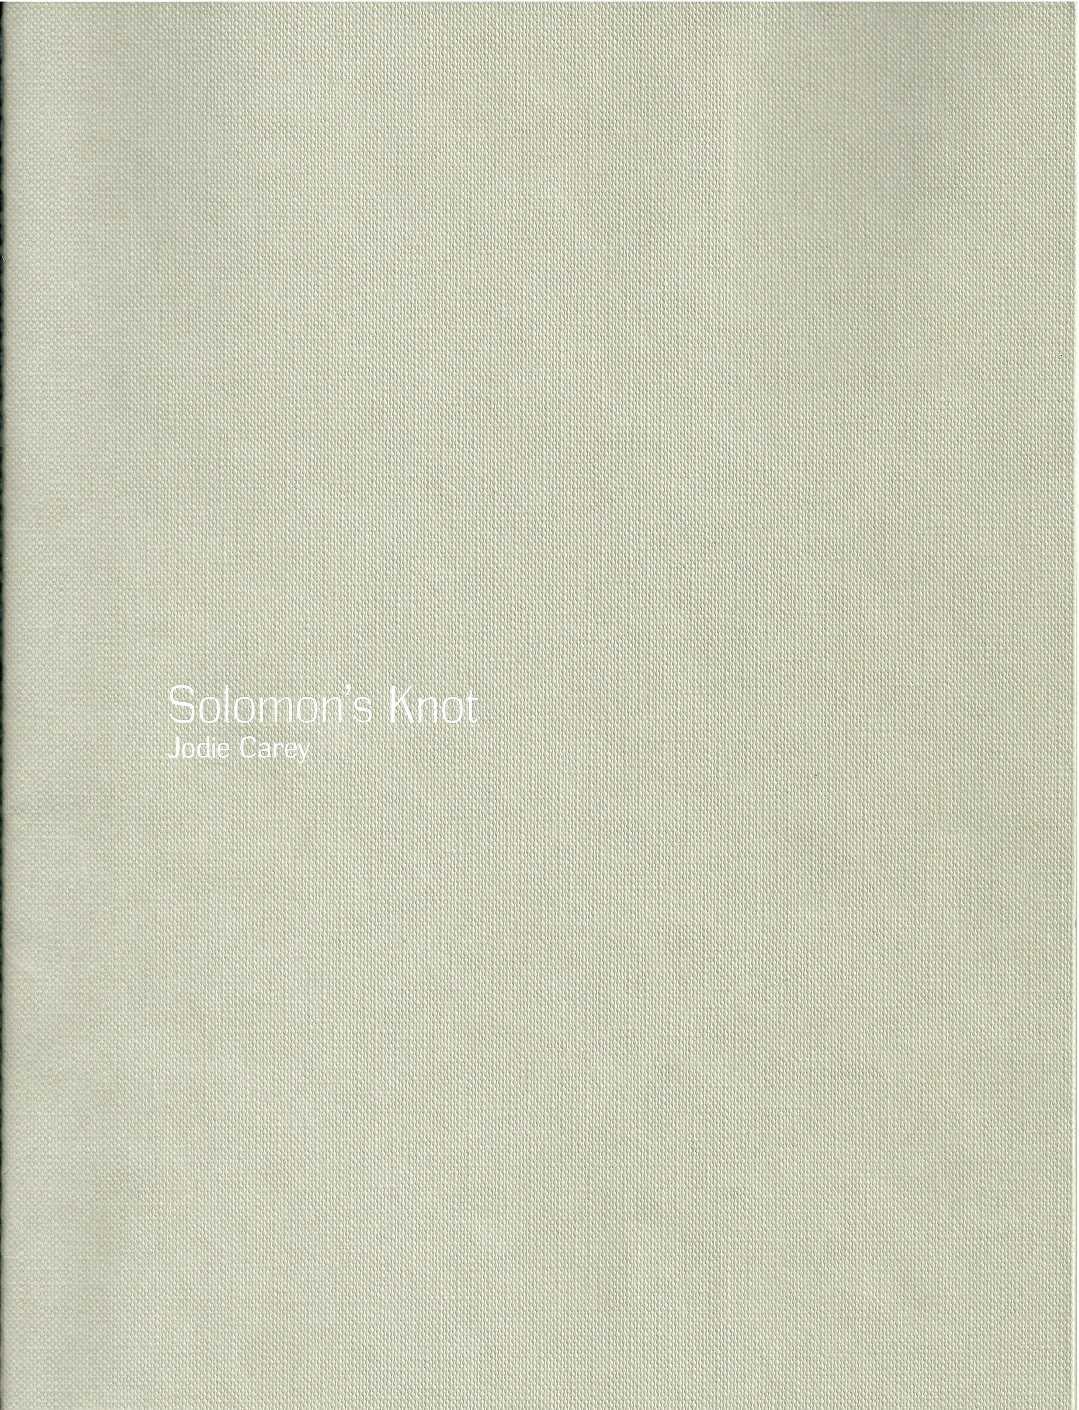 Jodie Carey: Solomon's Knot